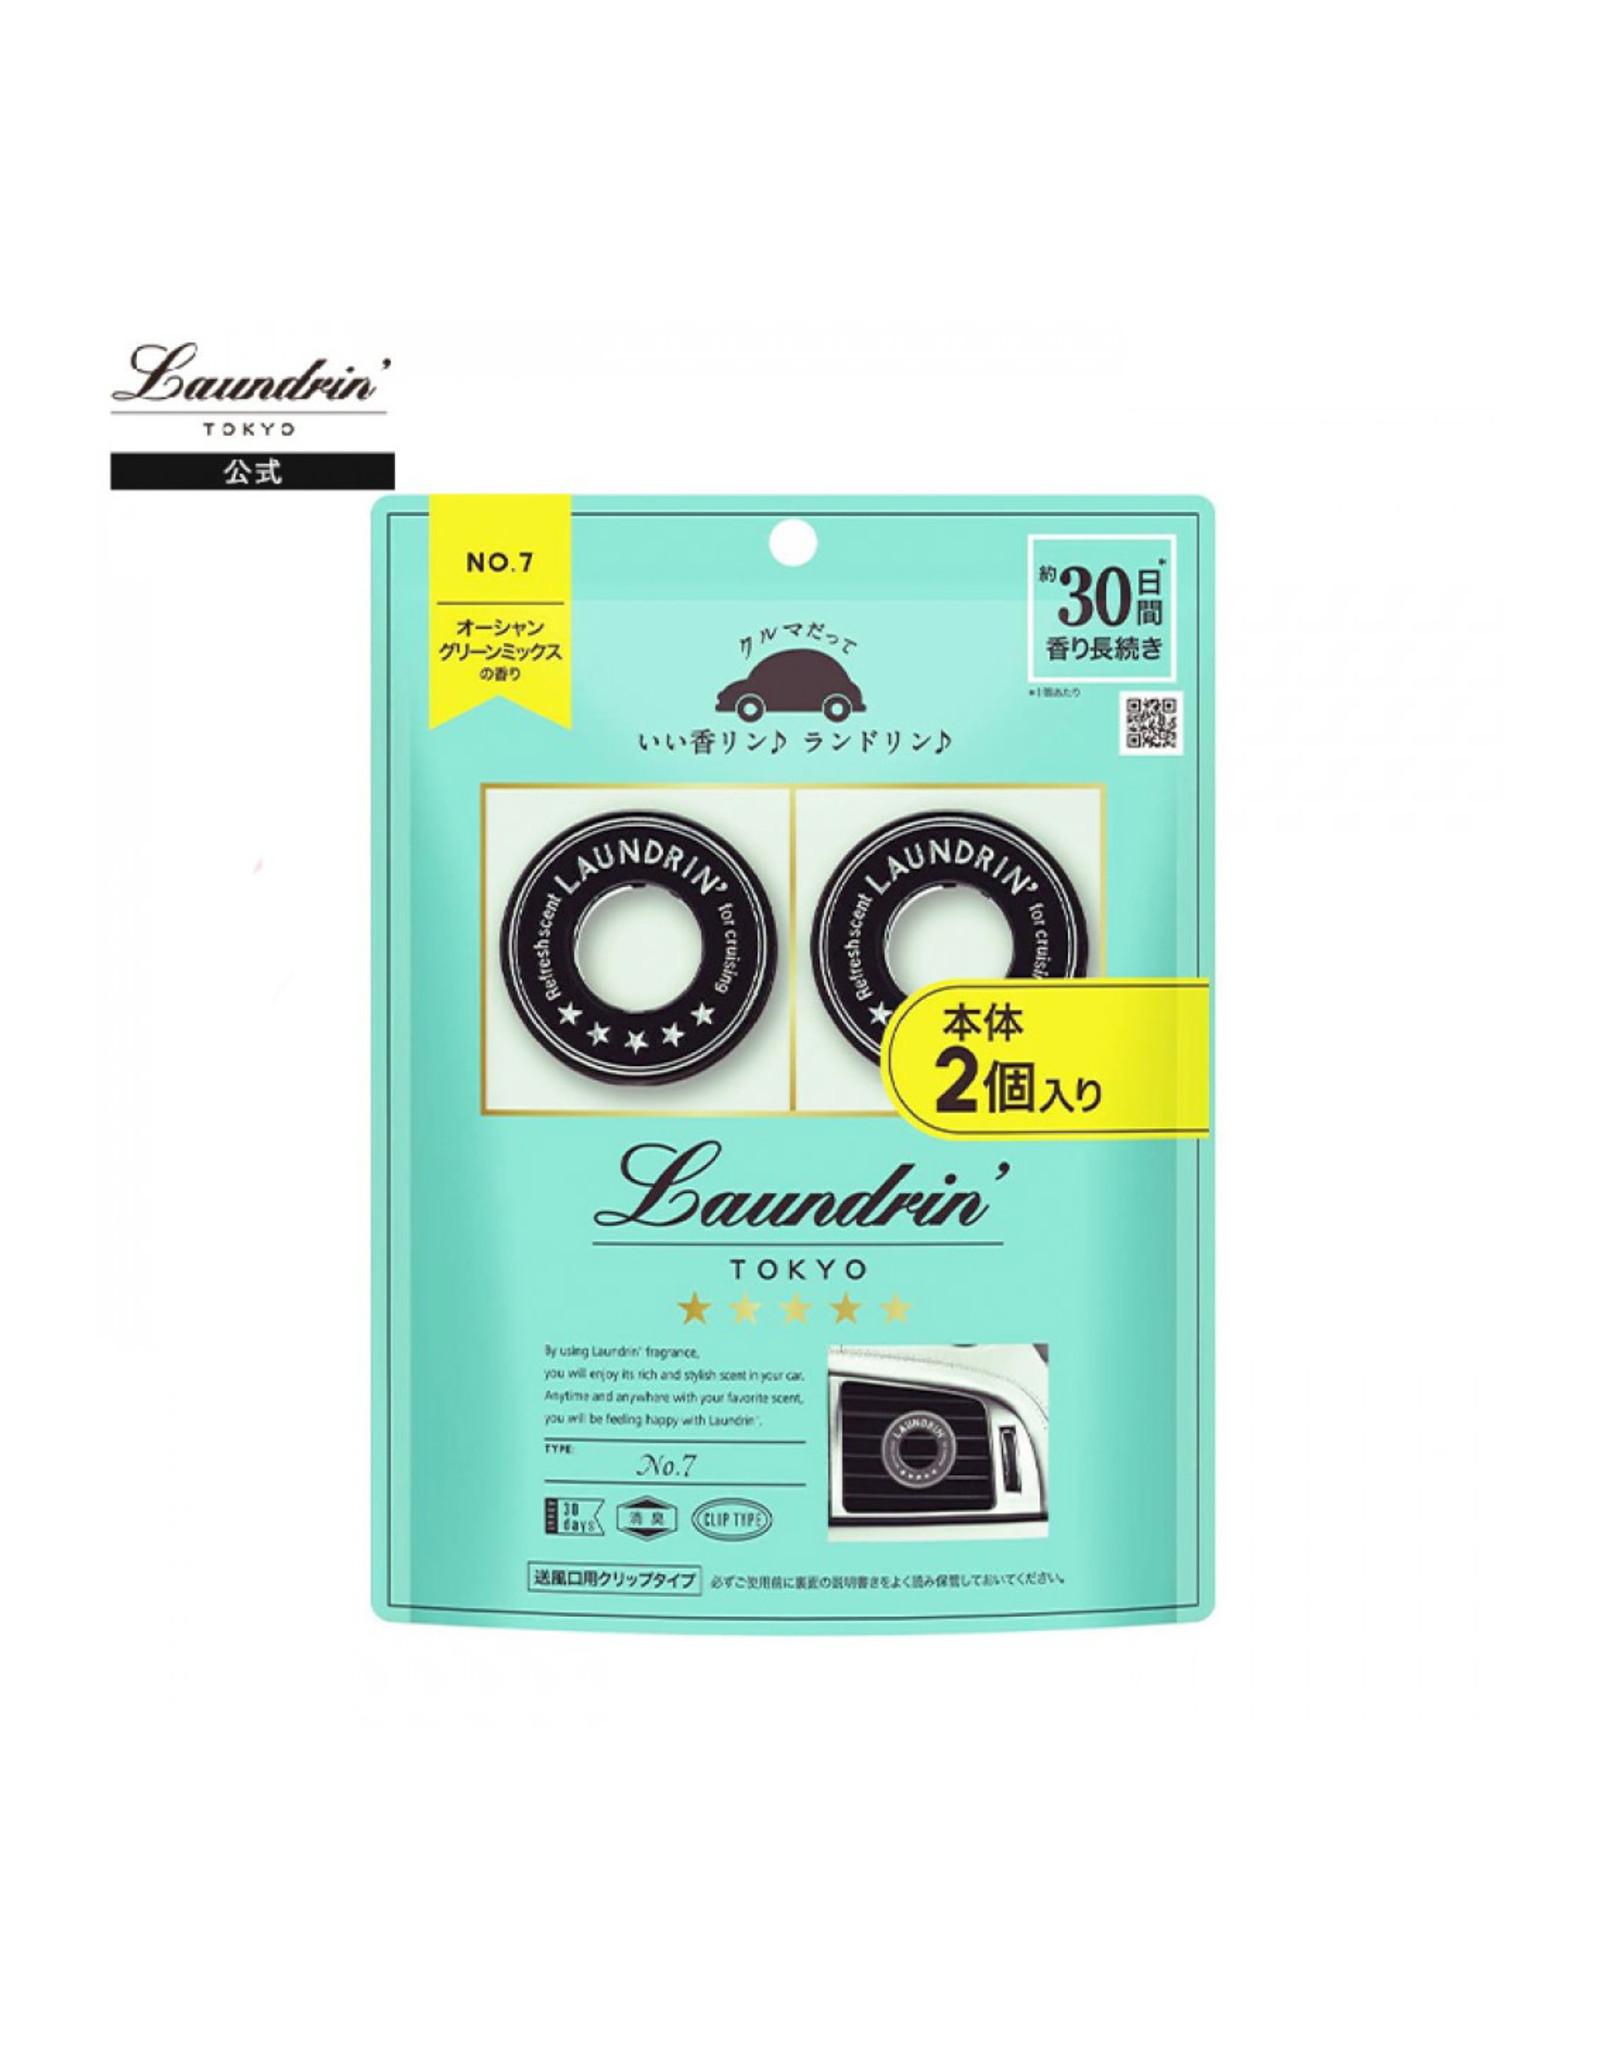 Laundrin Laundrin Fragrance For Car No.7 2Pcs